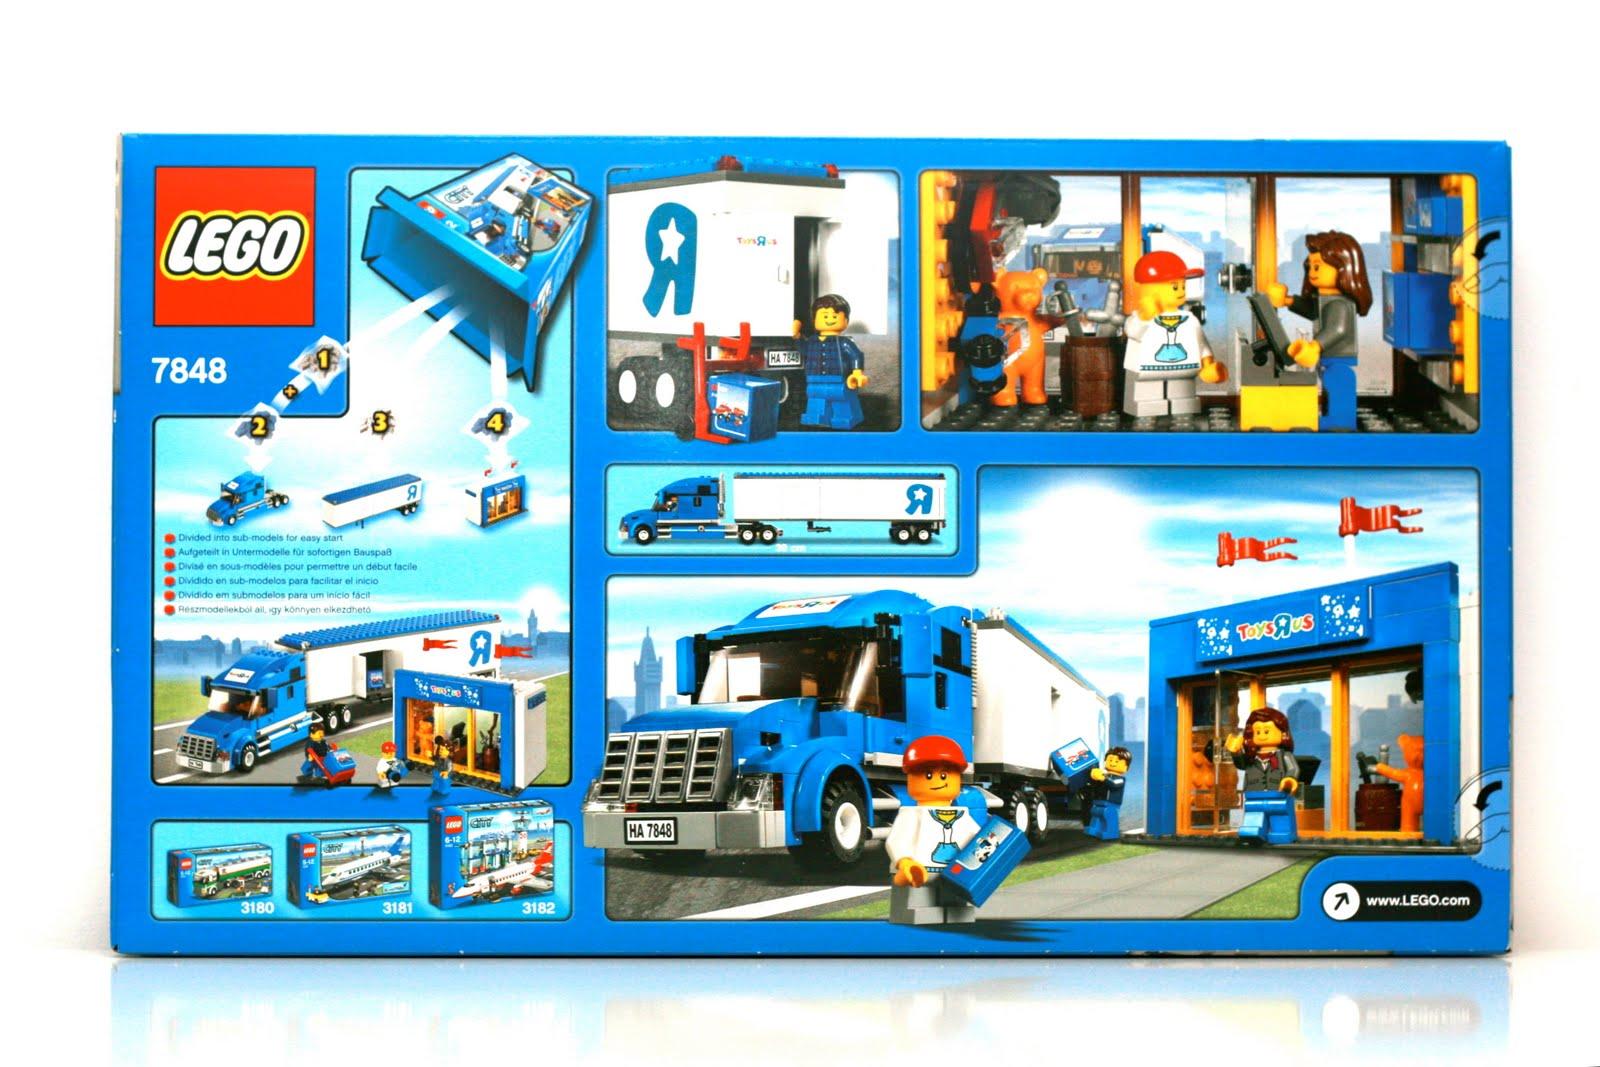 maniac des lego review lego city set 7848 camion toys. Black Bedroom Furniture Sets. Home Design Ideas